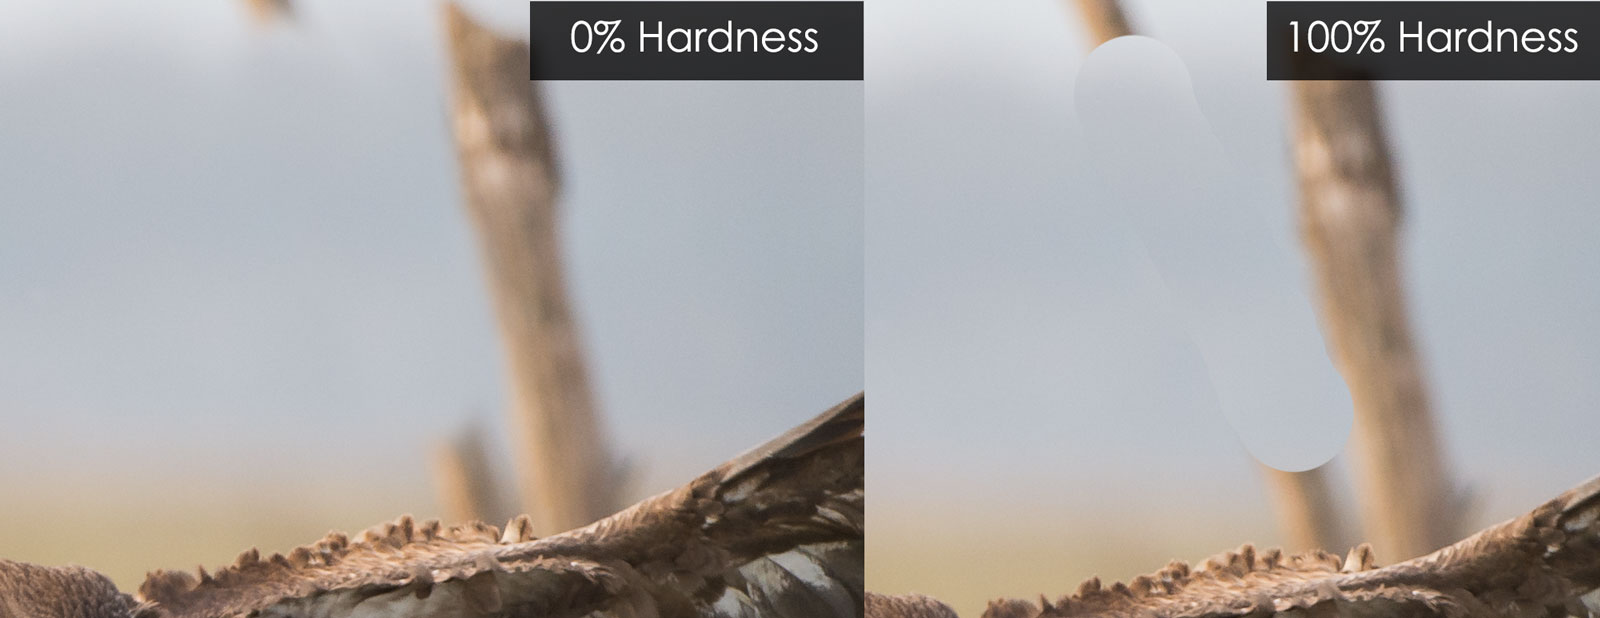 brush hardness comparison